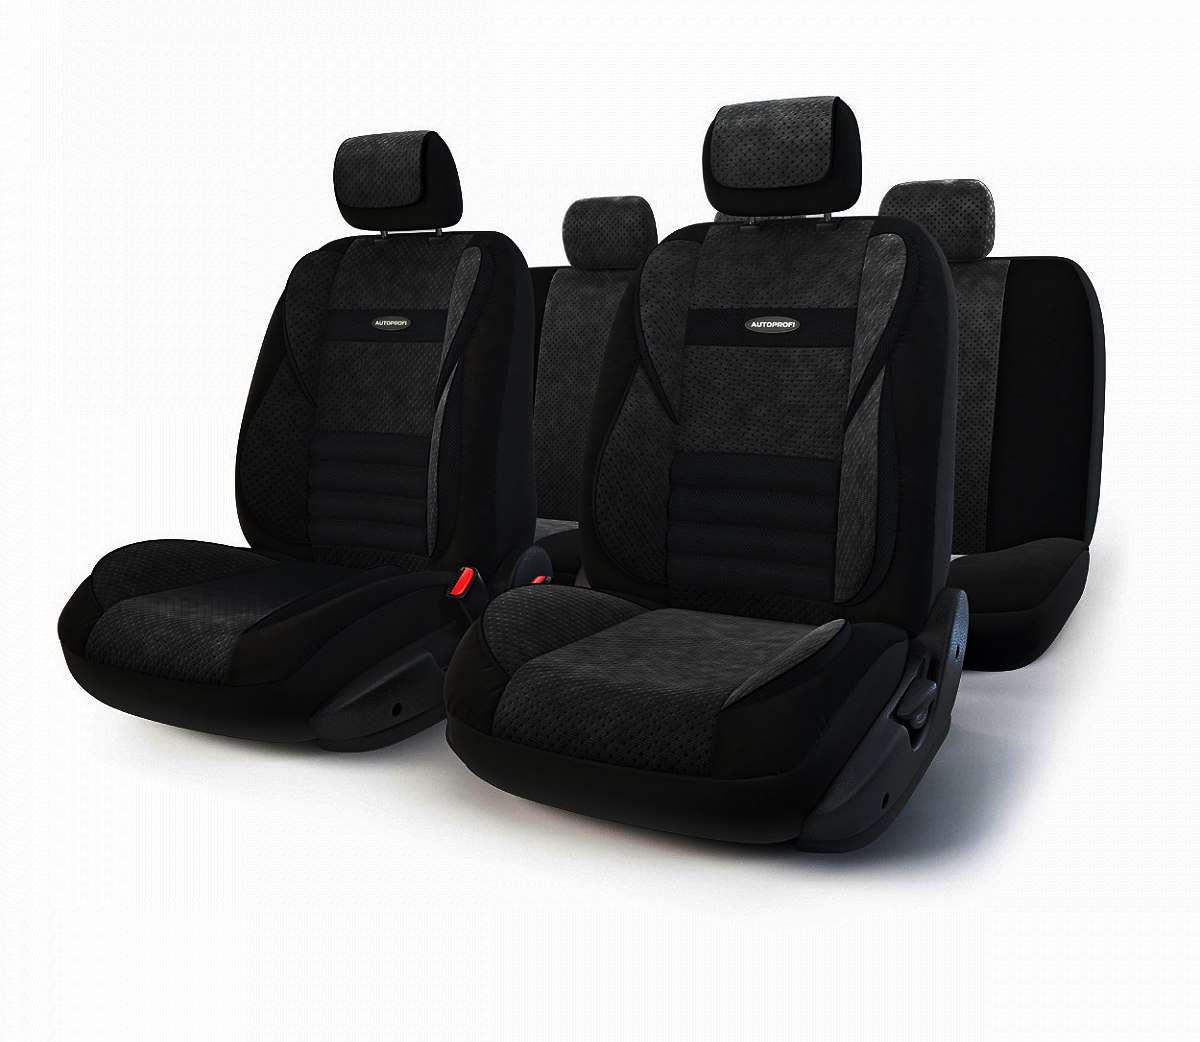 Чехол на сиденье Autoprofi Mlt-1105 bk/bk (m) чехол на сиденье autoprofi mtx 1105 bk d gy m